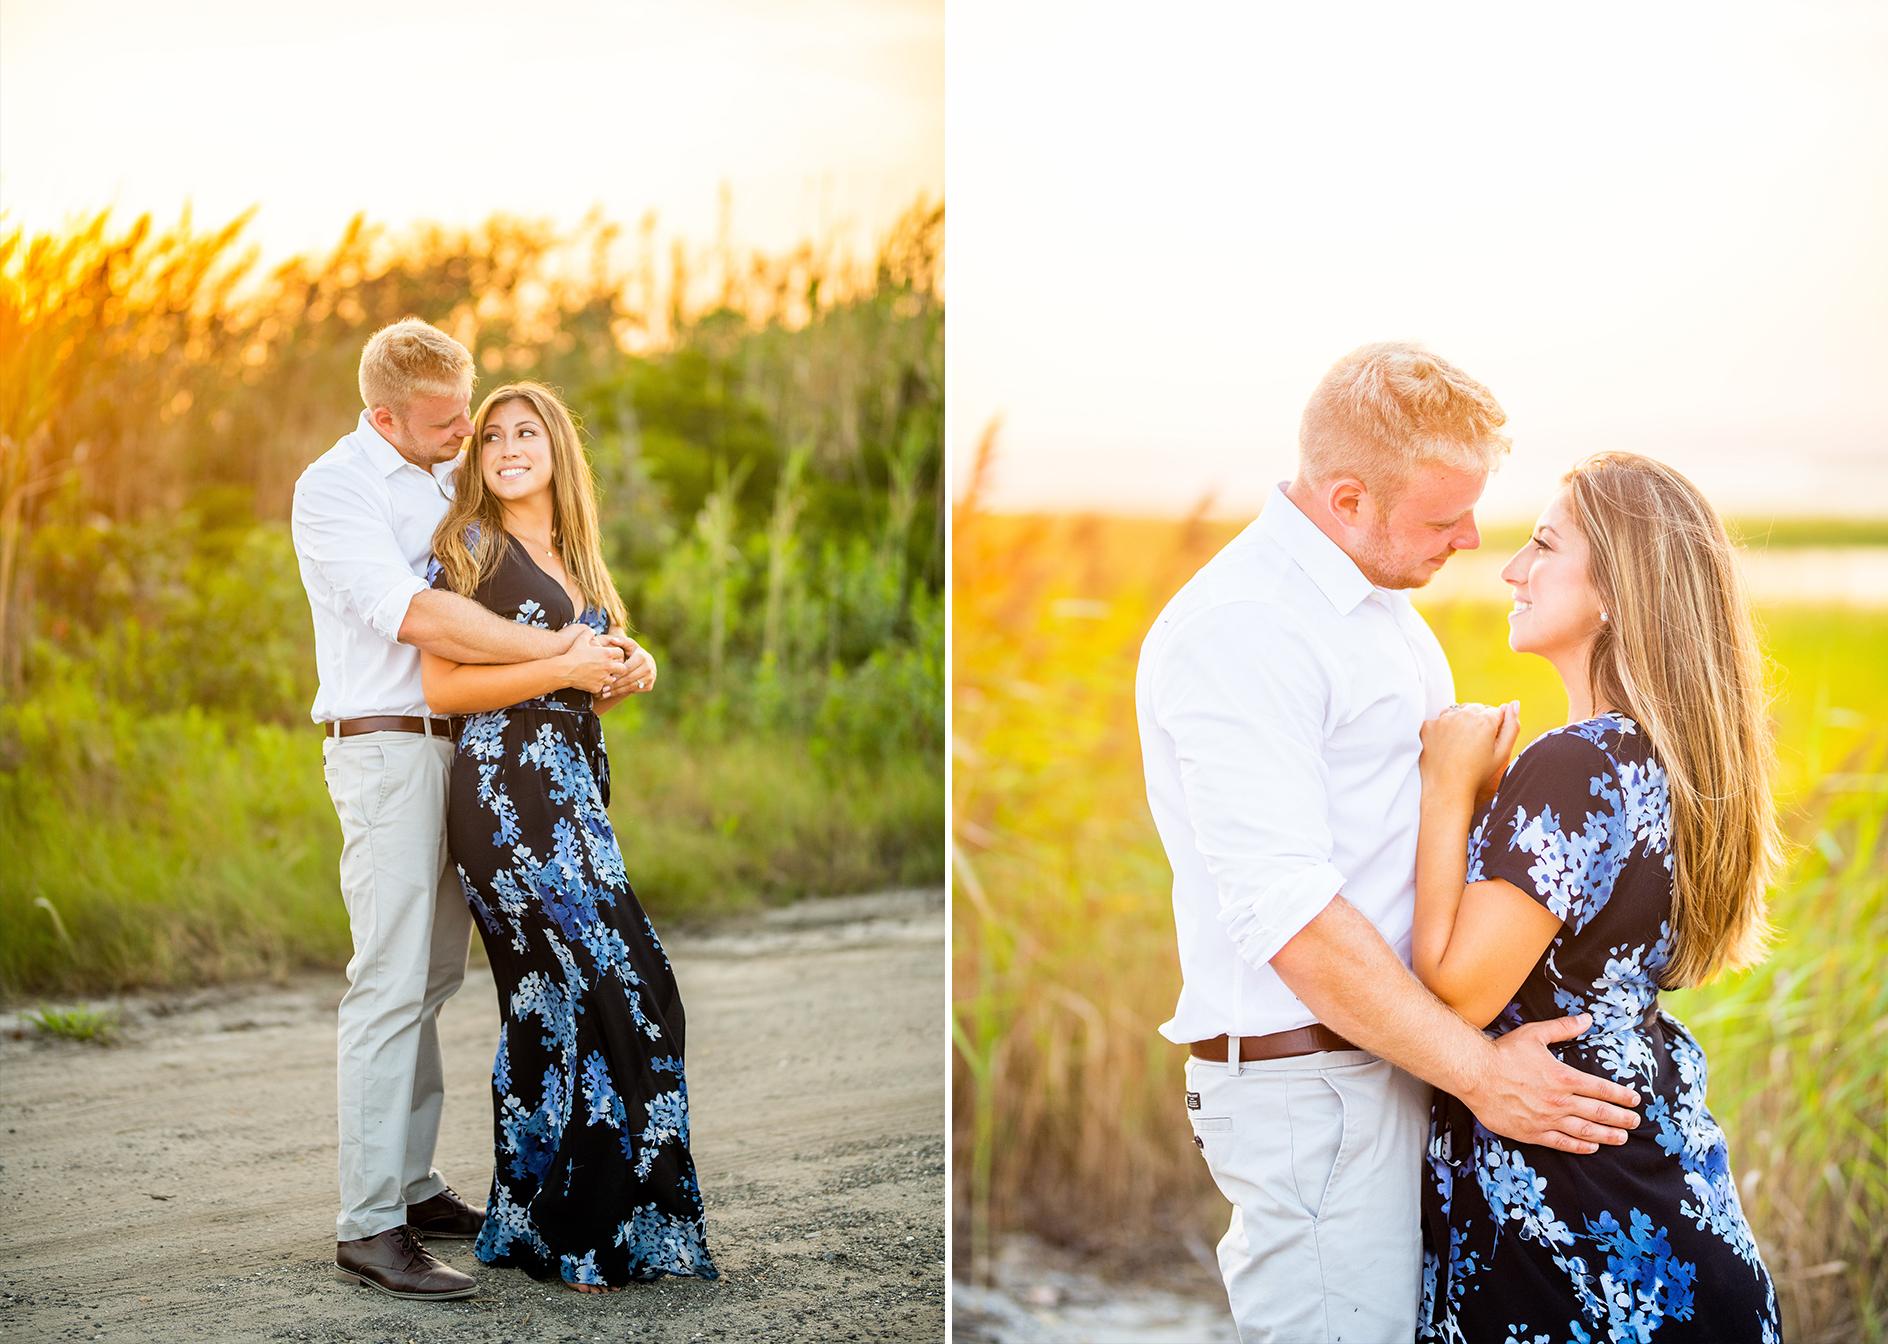 Dune Road Engagement Shoot | Westhampton Beach Engagement Shoot | Hamptons Wedding Photographer7